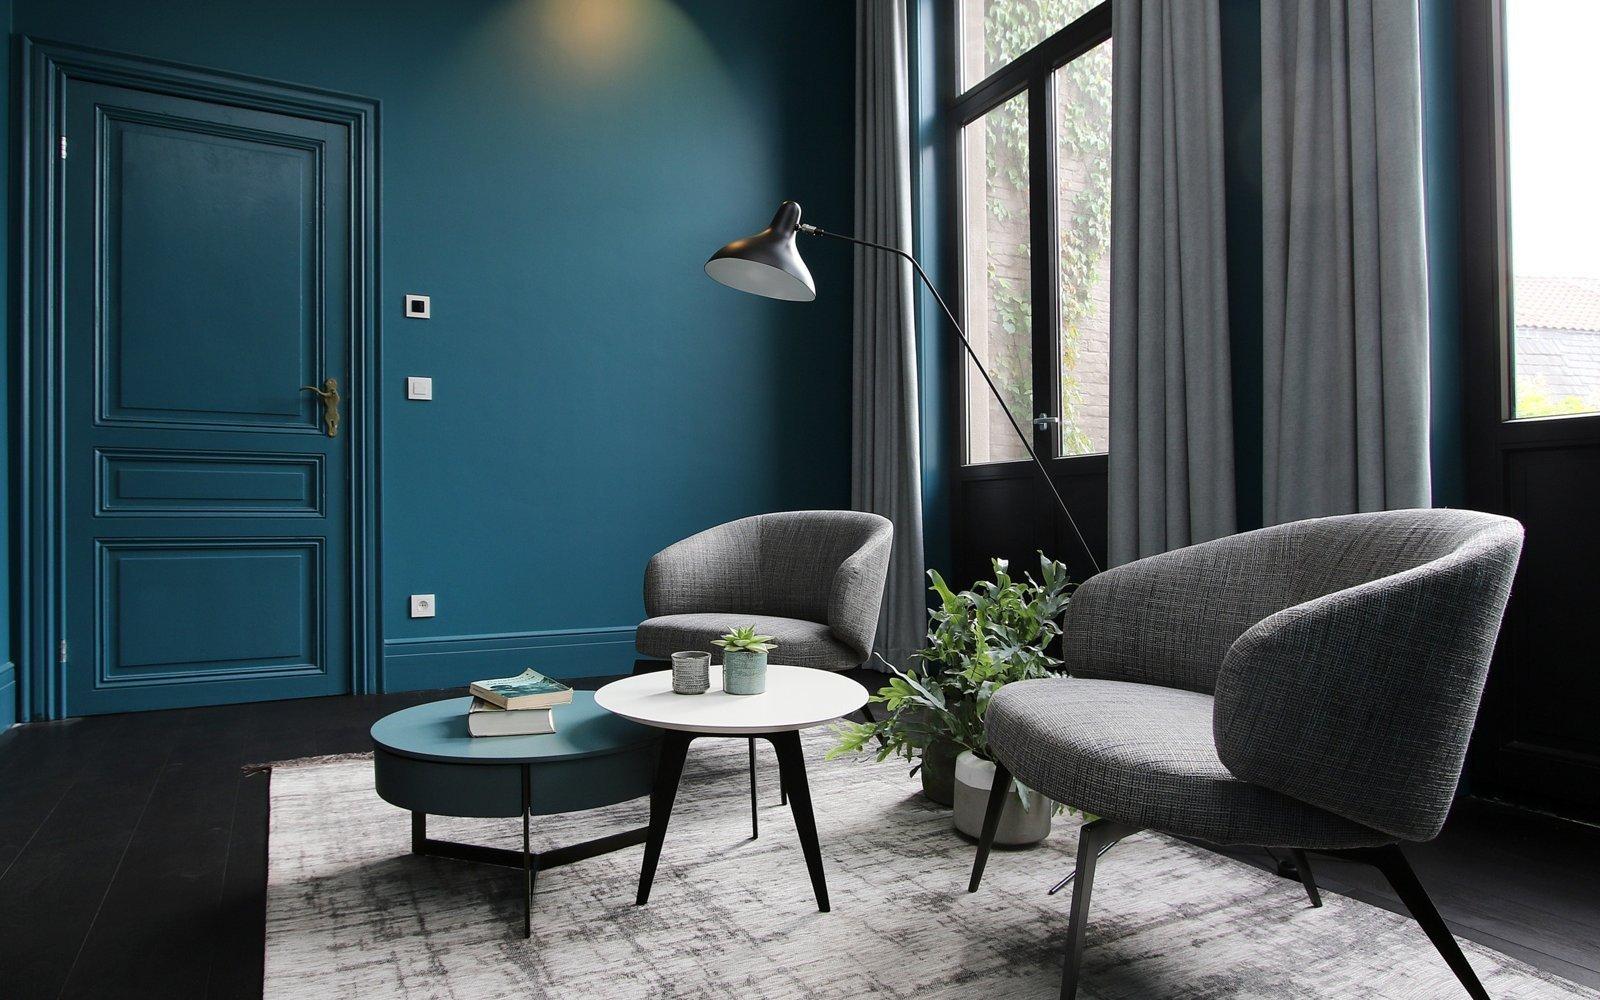 CB Gent - Totaalproject interieur